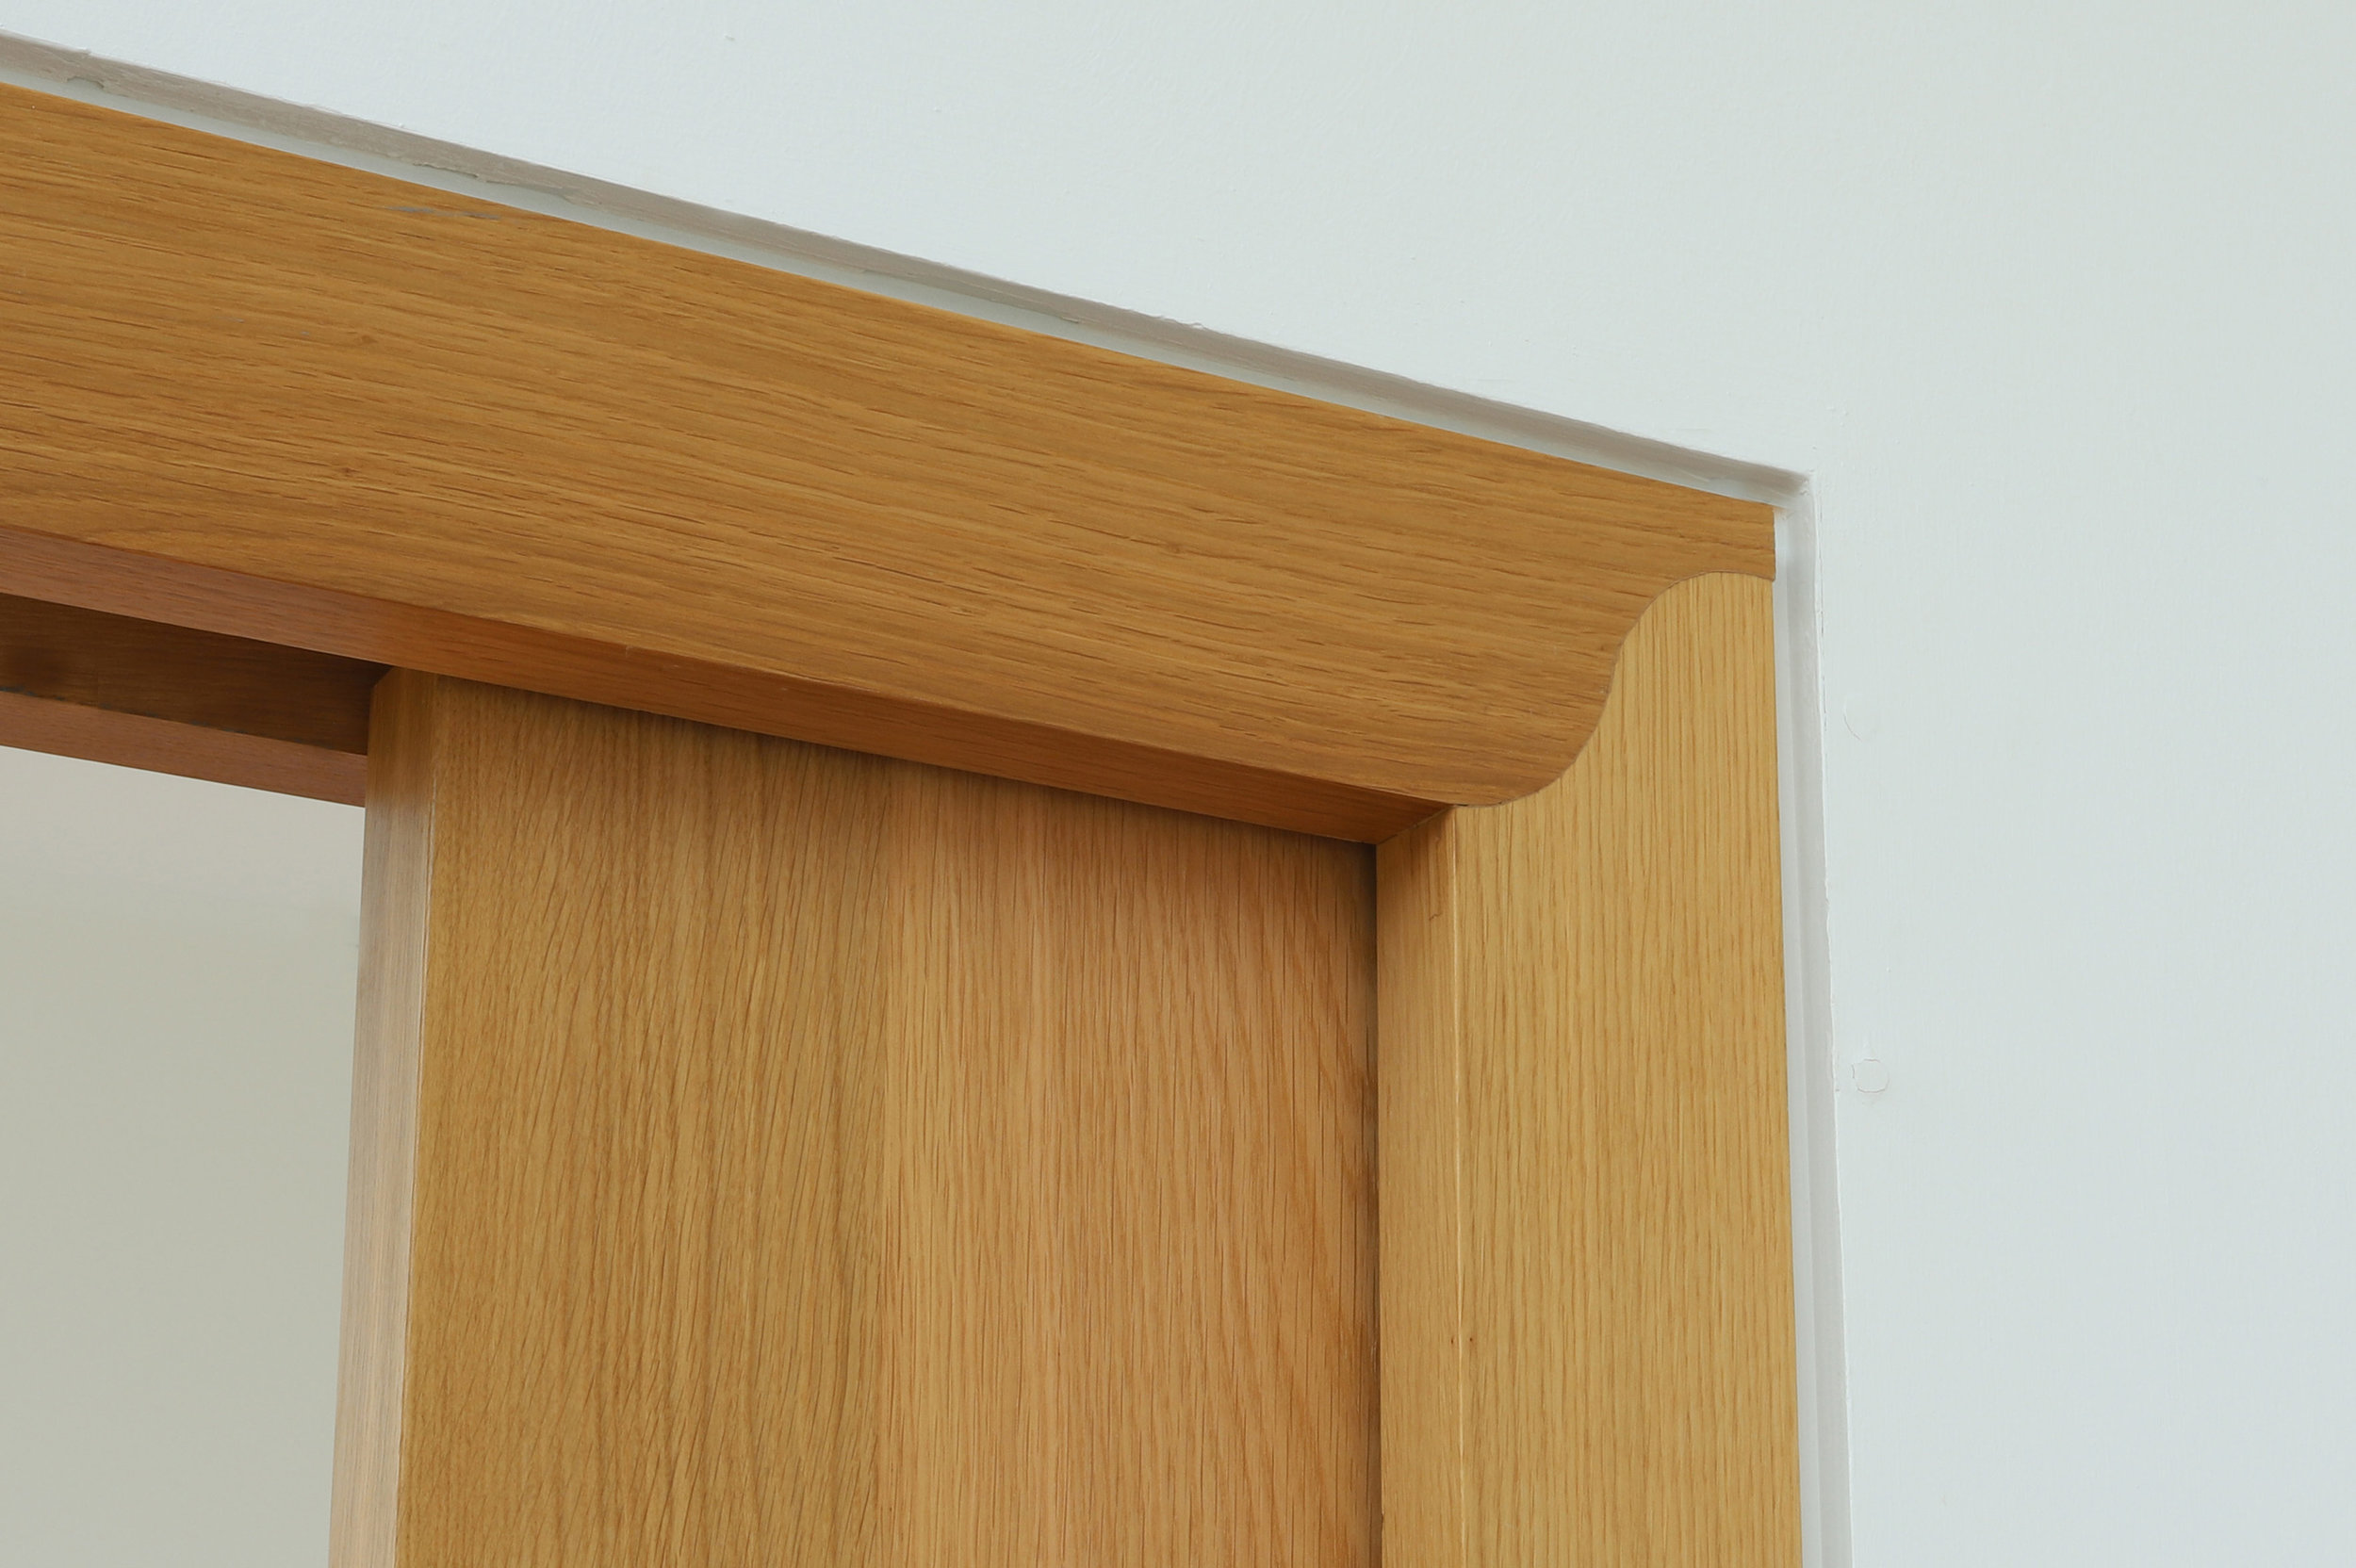 Sliding door made from oak with bespoke mitre detail, Ripple Retreat Loch Venachar.